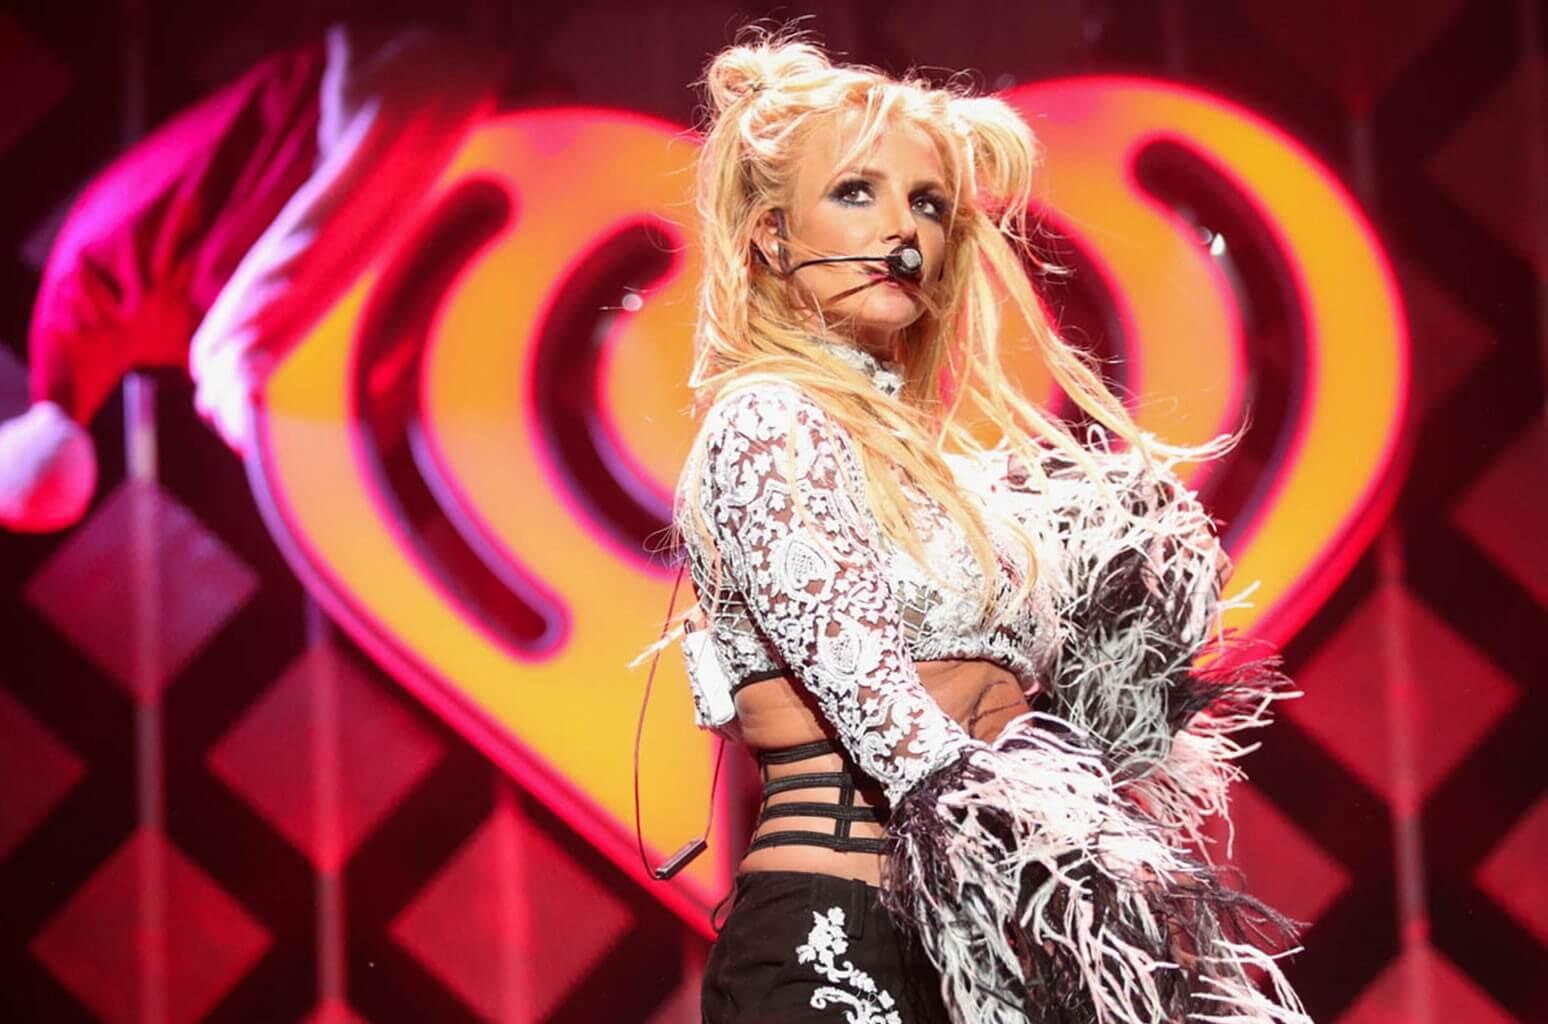 Britney Spearsのアルバム売上ランキングトップ10とおすすめ全アルバムまとめ